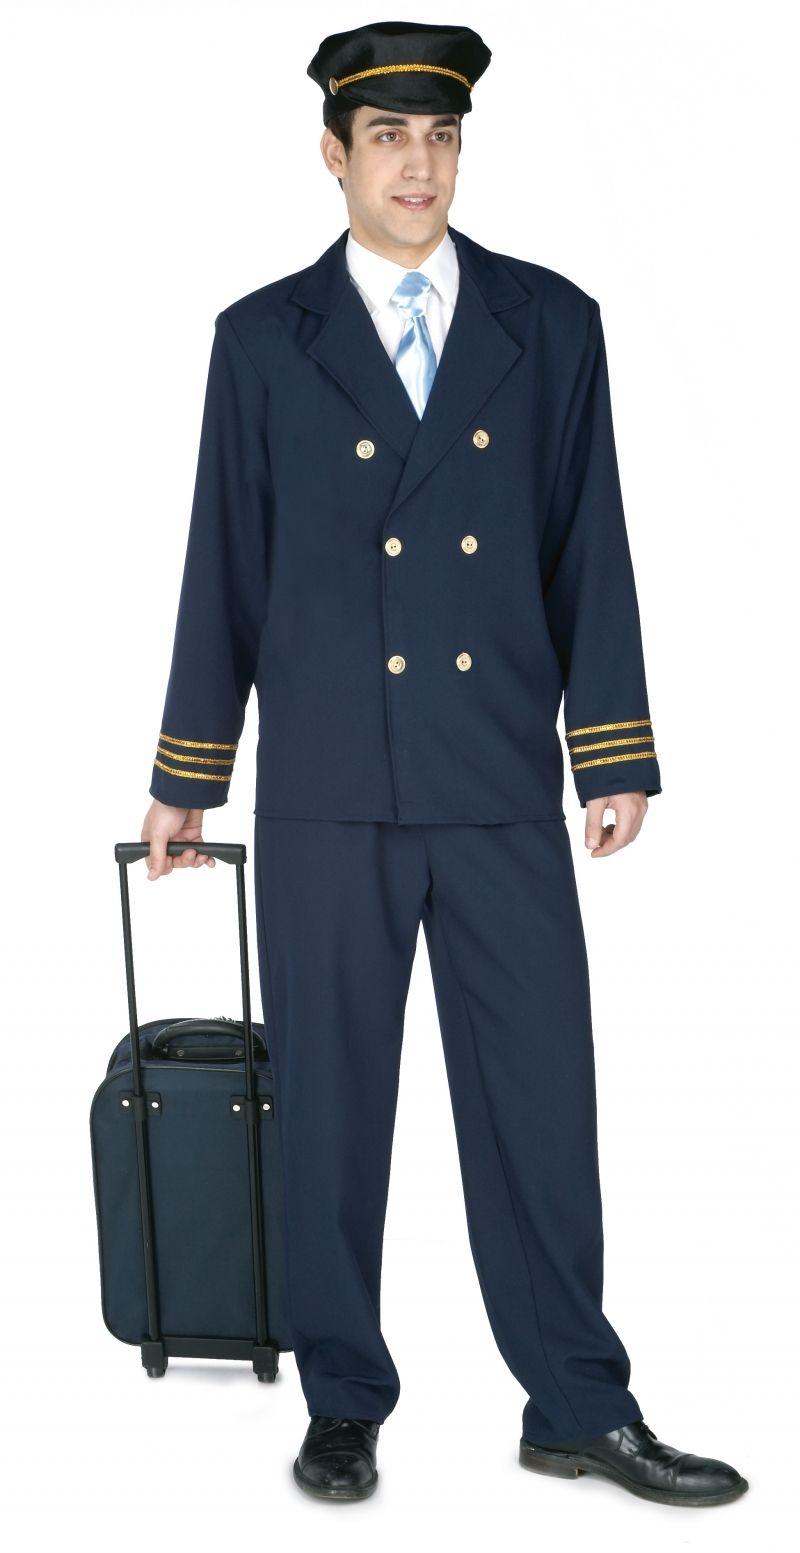 #Disfraz de Piloto de Avion adulto #costume http://www.leondisfraces.es/disfraz-de-piloto-de-avion-adulto-producto-1533